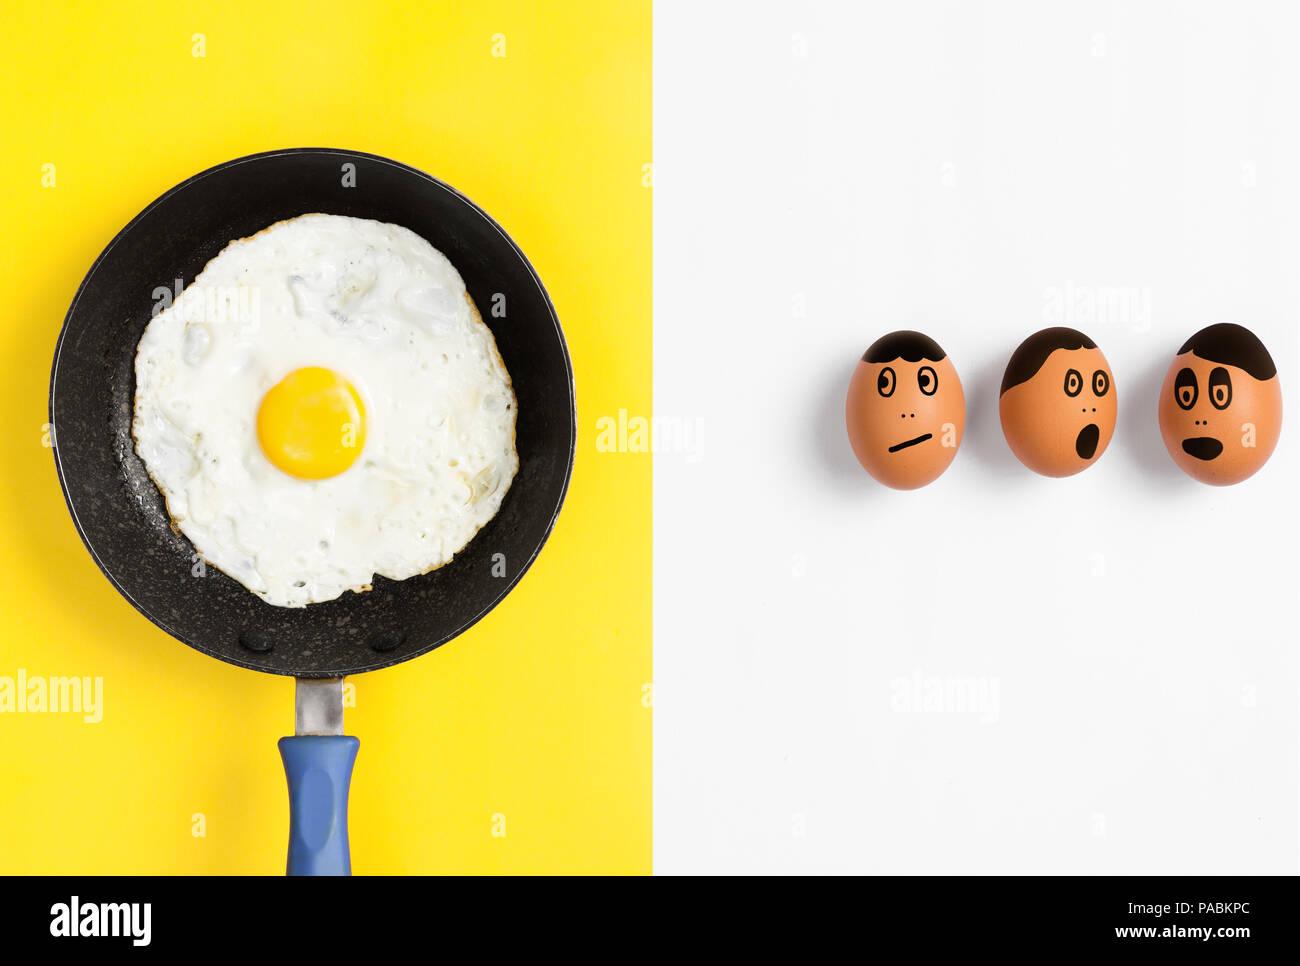 Huevo frito en pan con caras dibujadas en los huevos crudos mirando preocupado, laicos plana imagen de alimentos Imagen De Stock